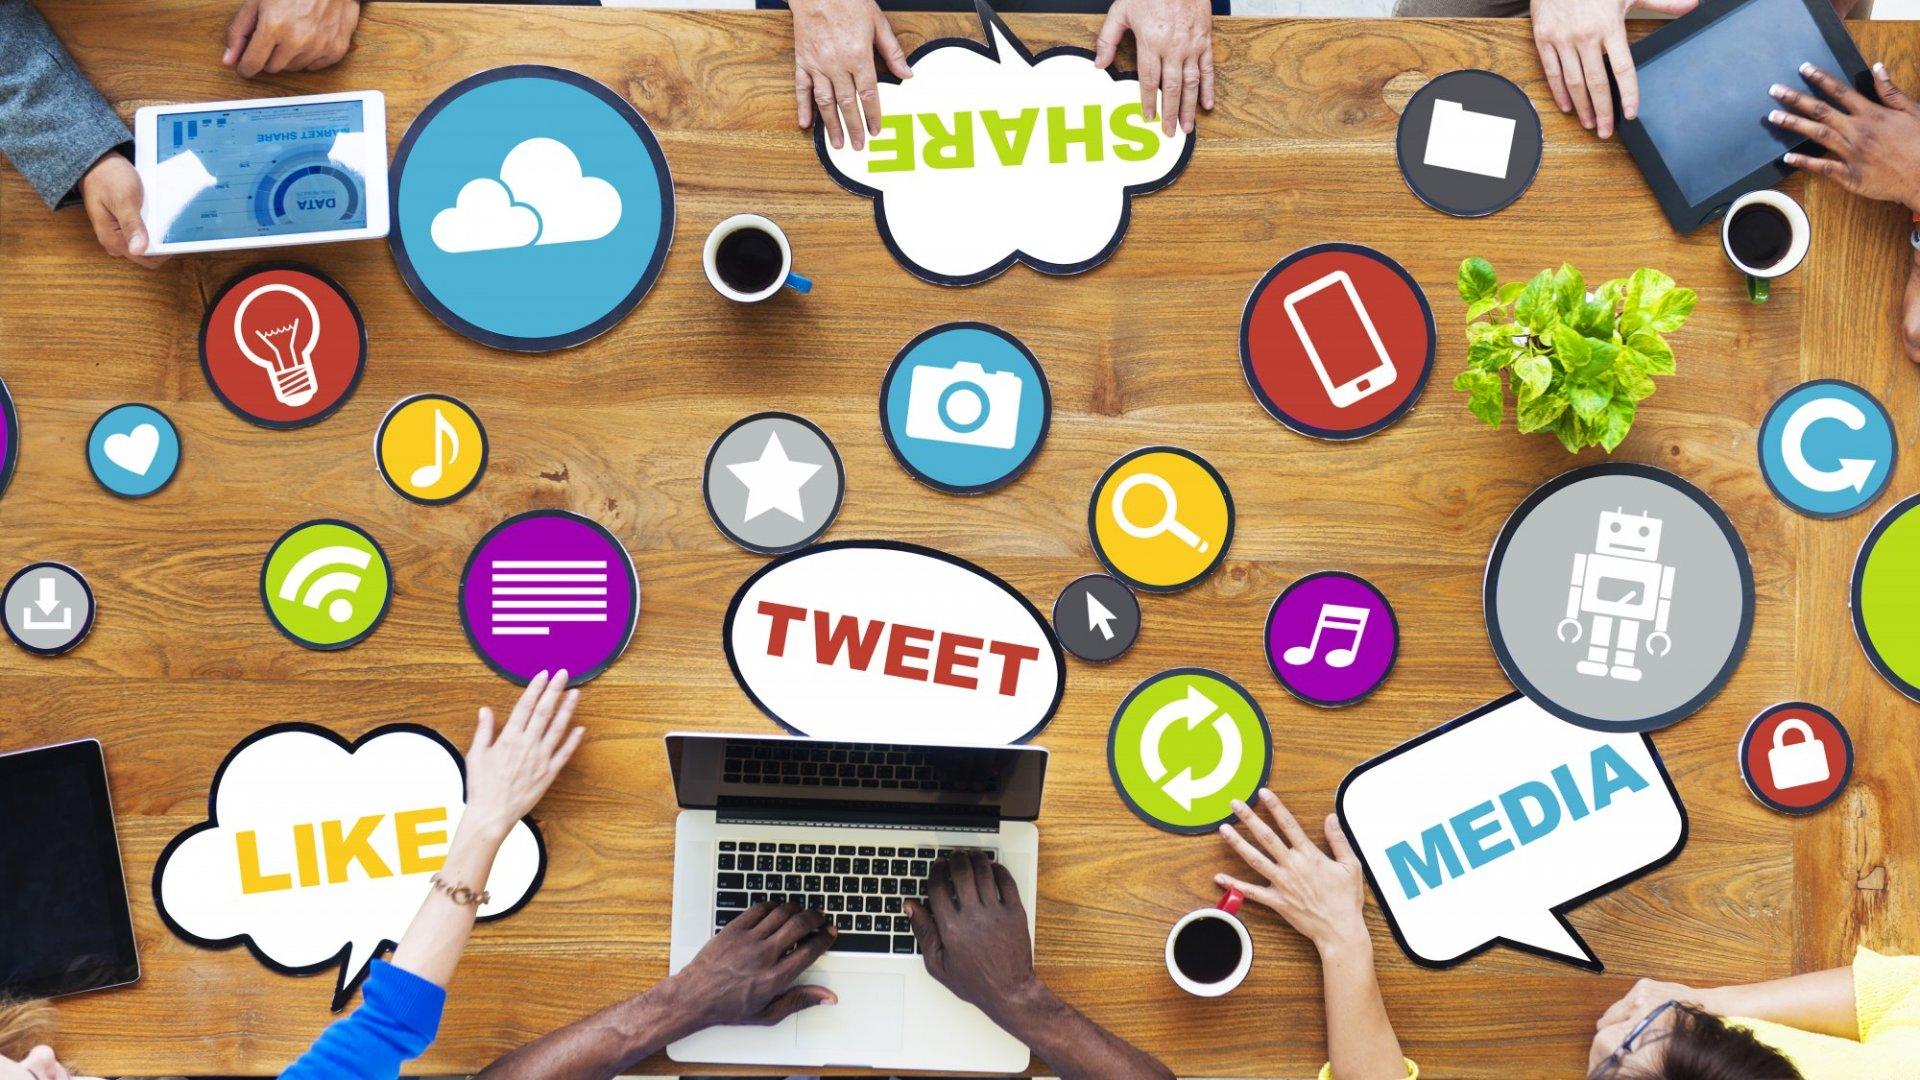 59% of Entrepreneurs Don't View Social Media as Essential, Per This New Survey